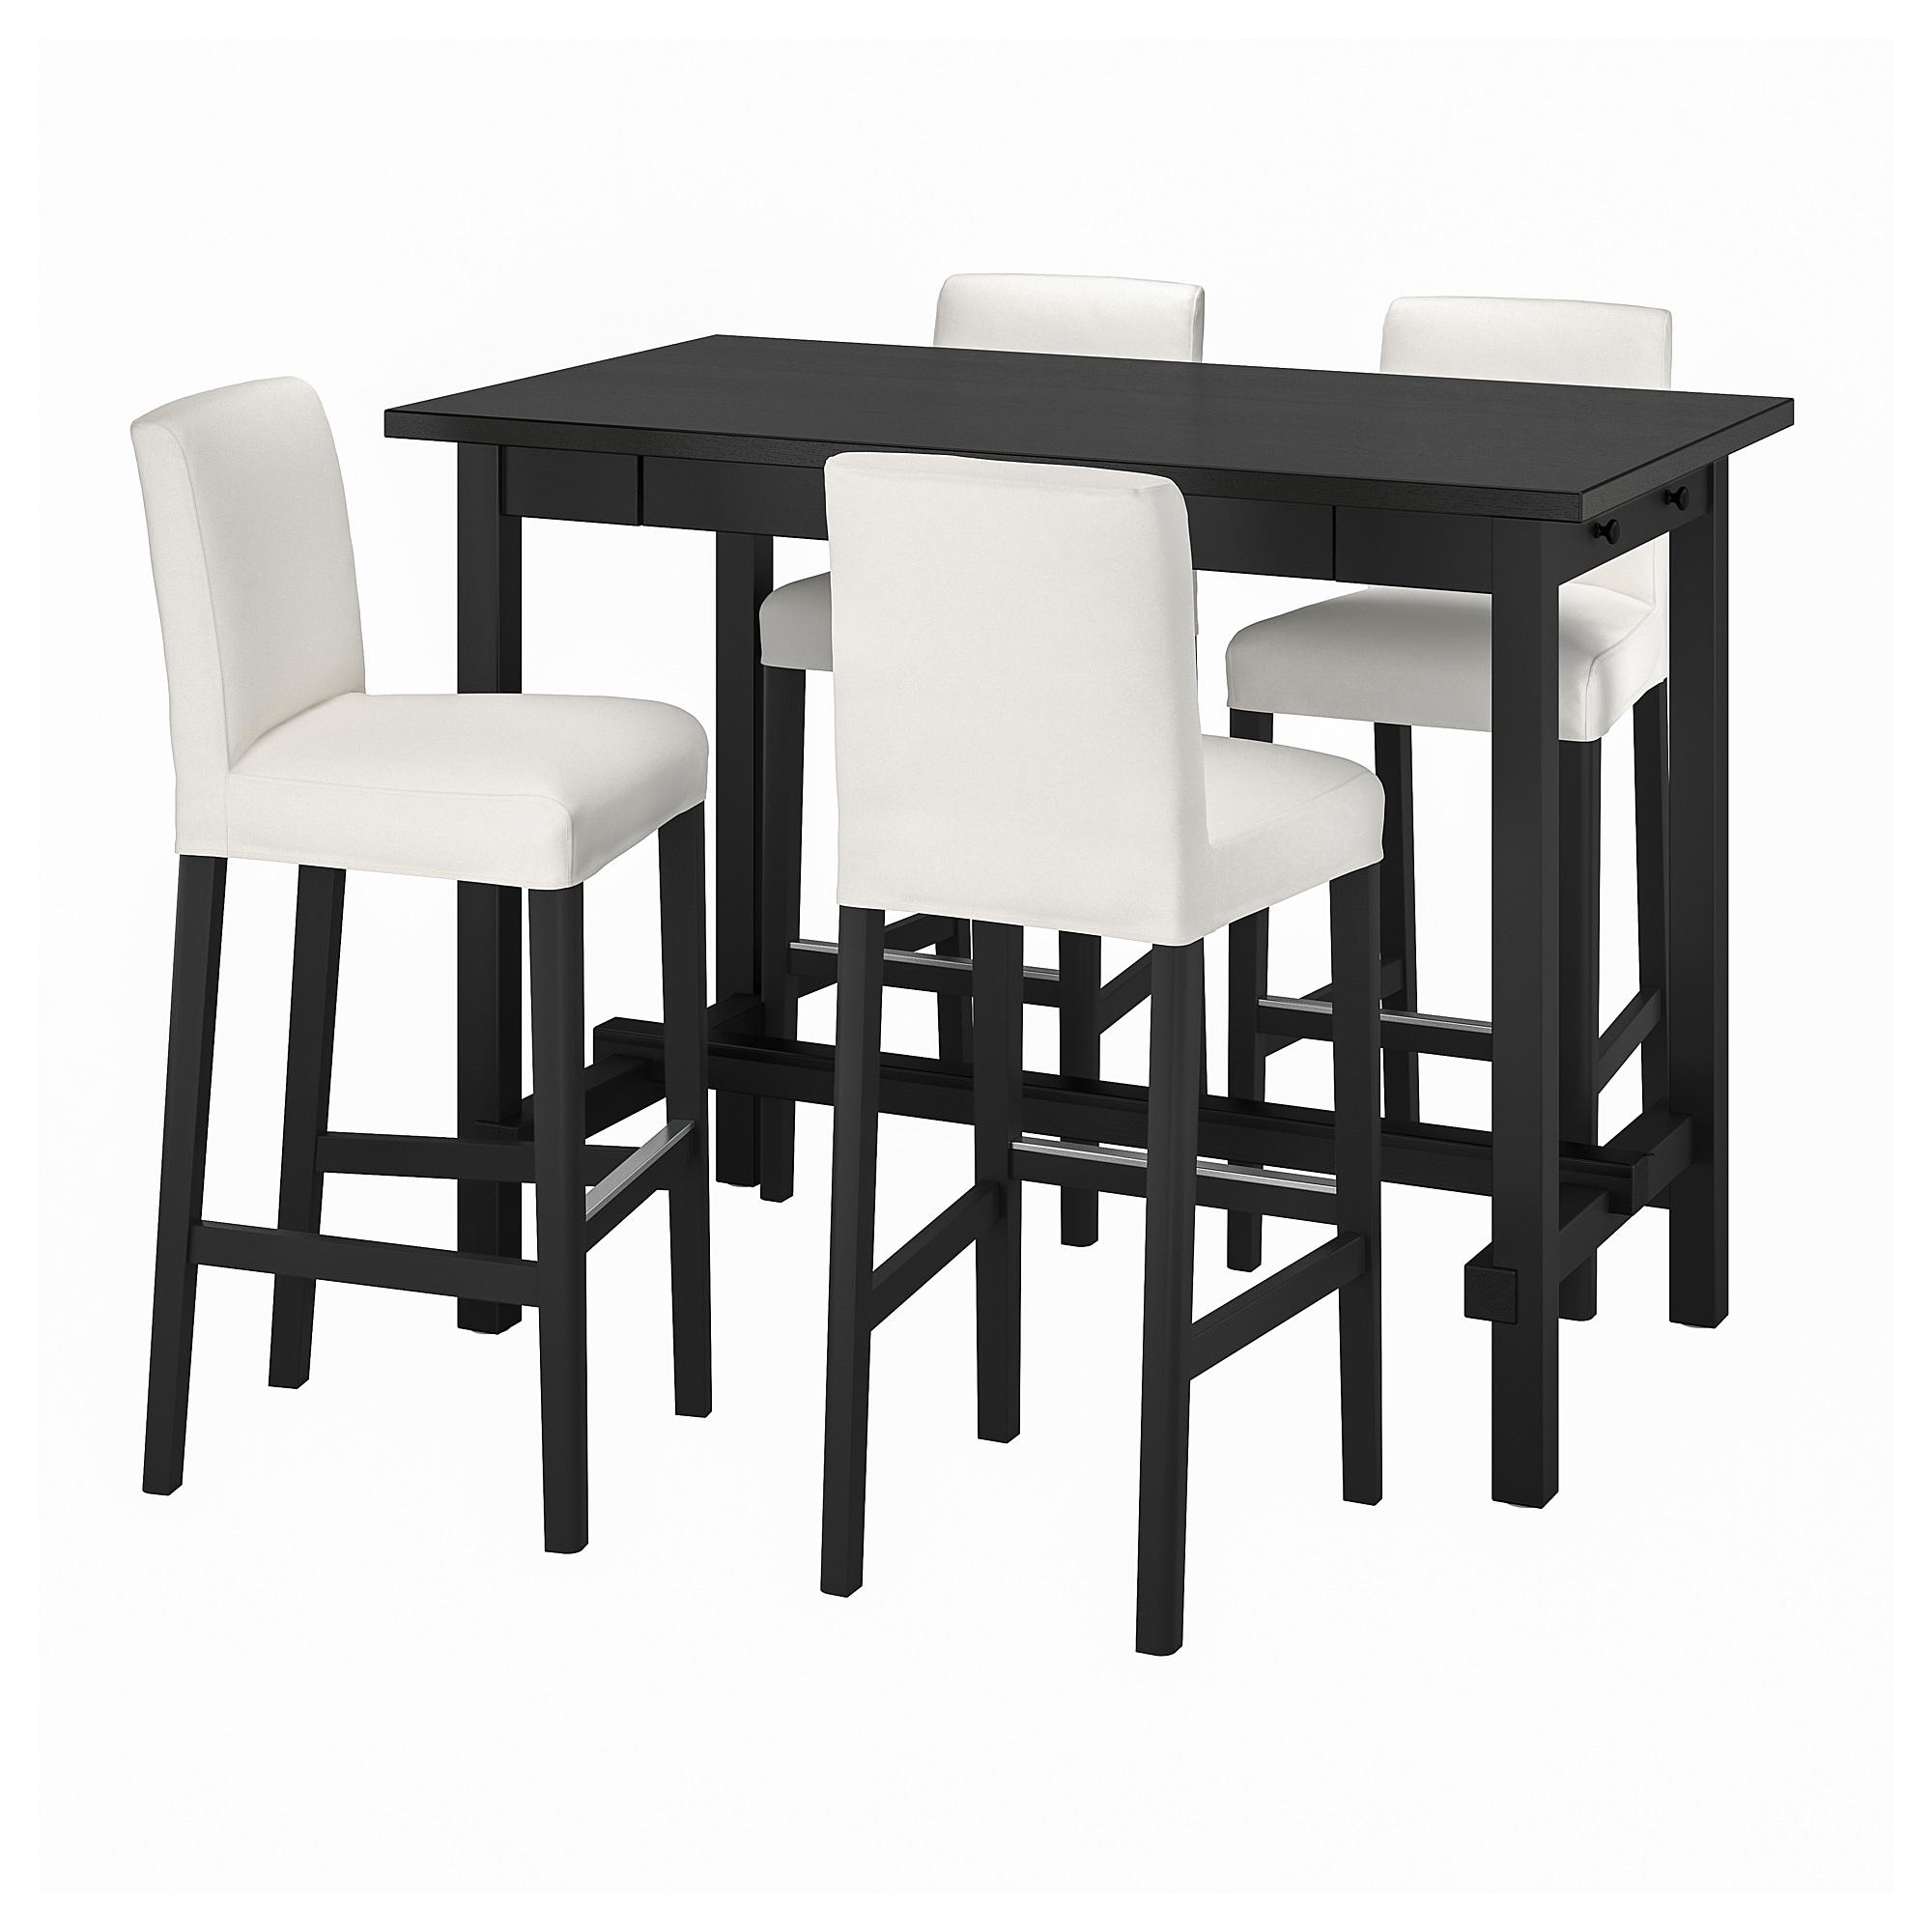 Bergmund Nordviken Meja Bar Dan 4 Bangku Bar Hitam Inseros Putih Hitam Ikea Indonesia